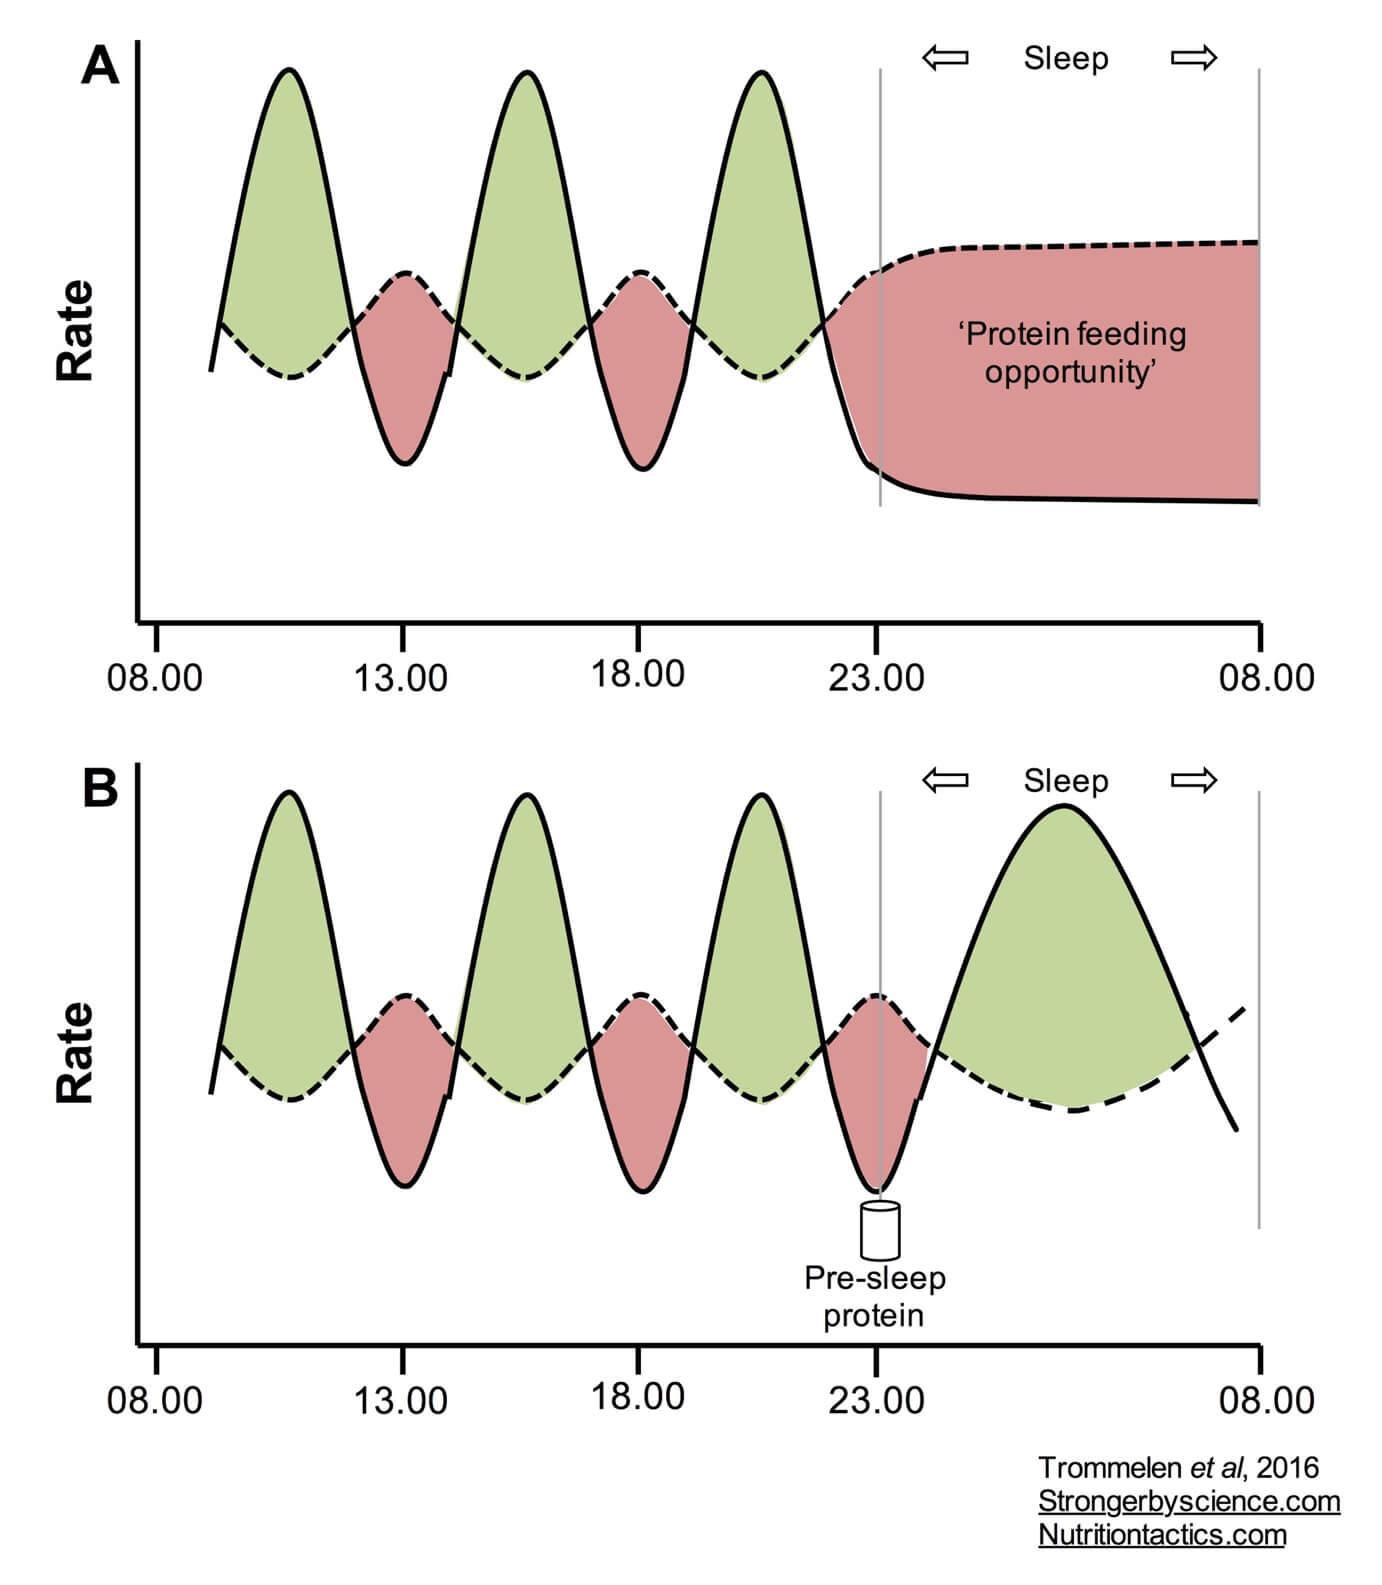 pre-sleep protein intake